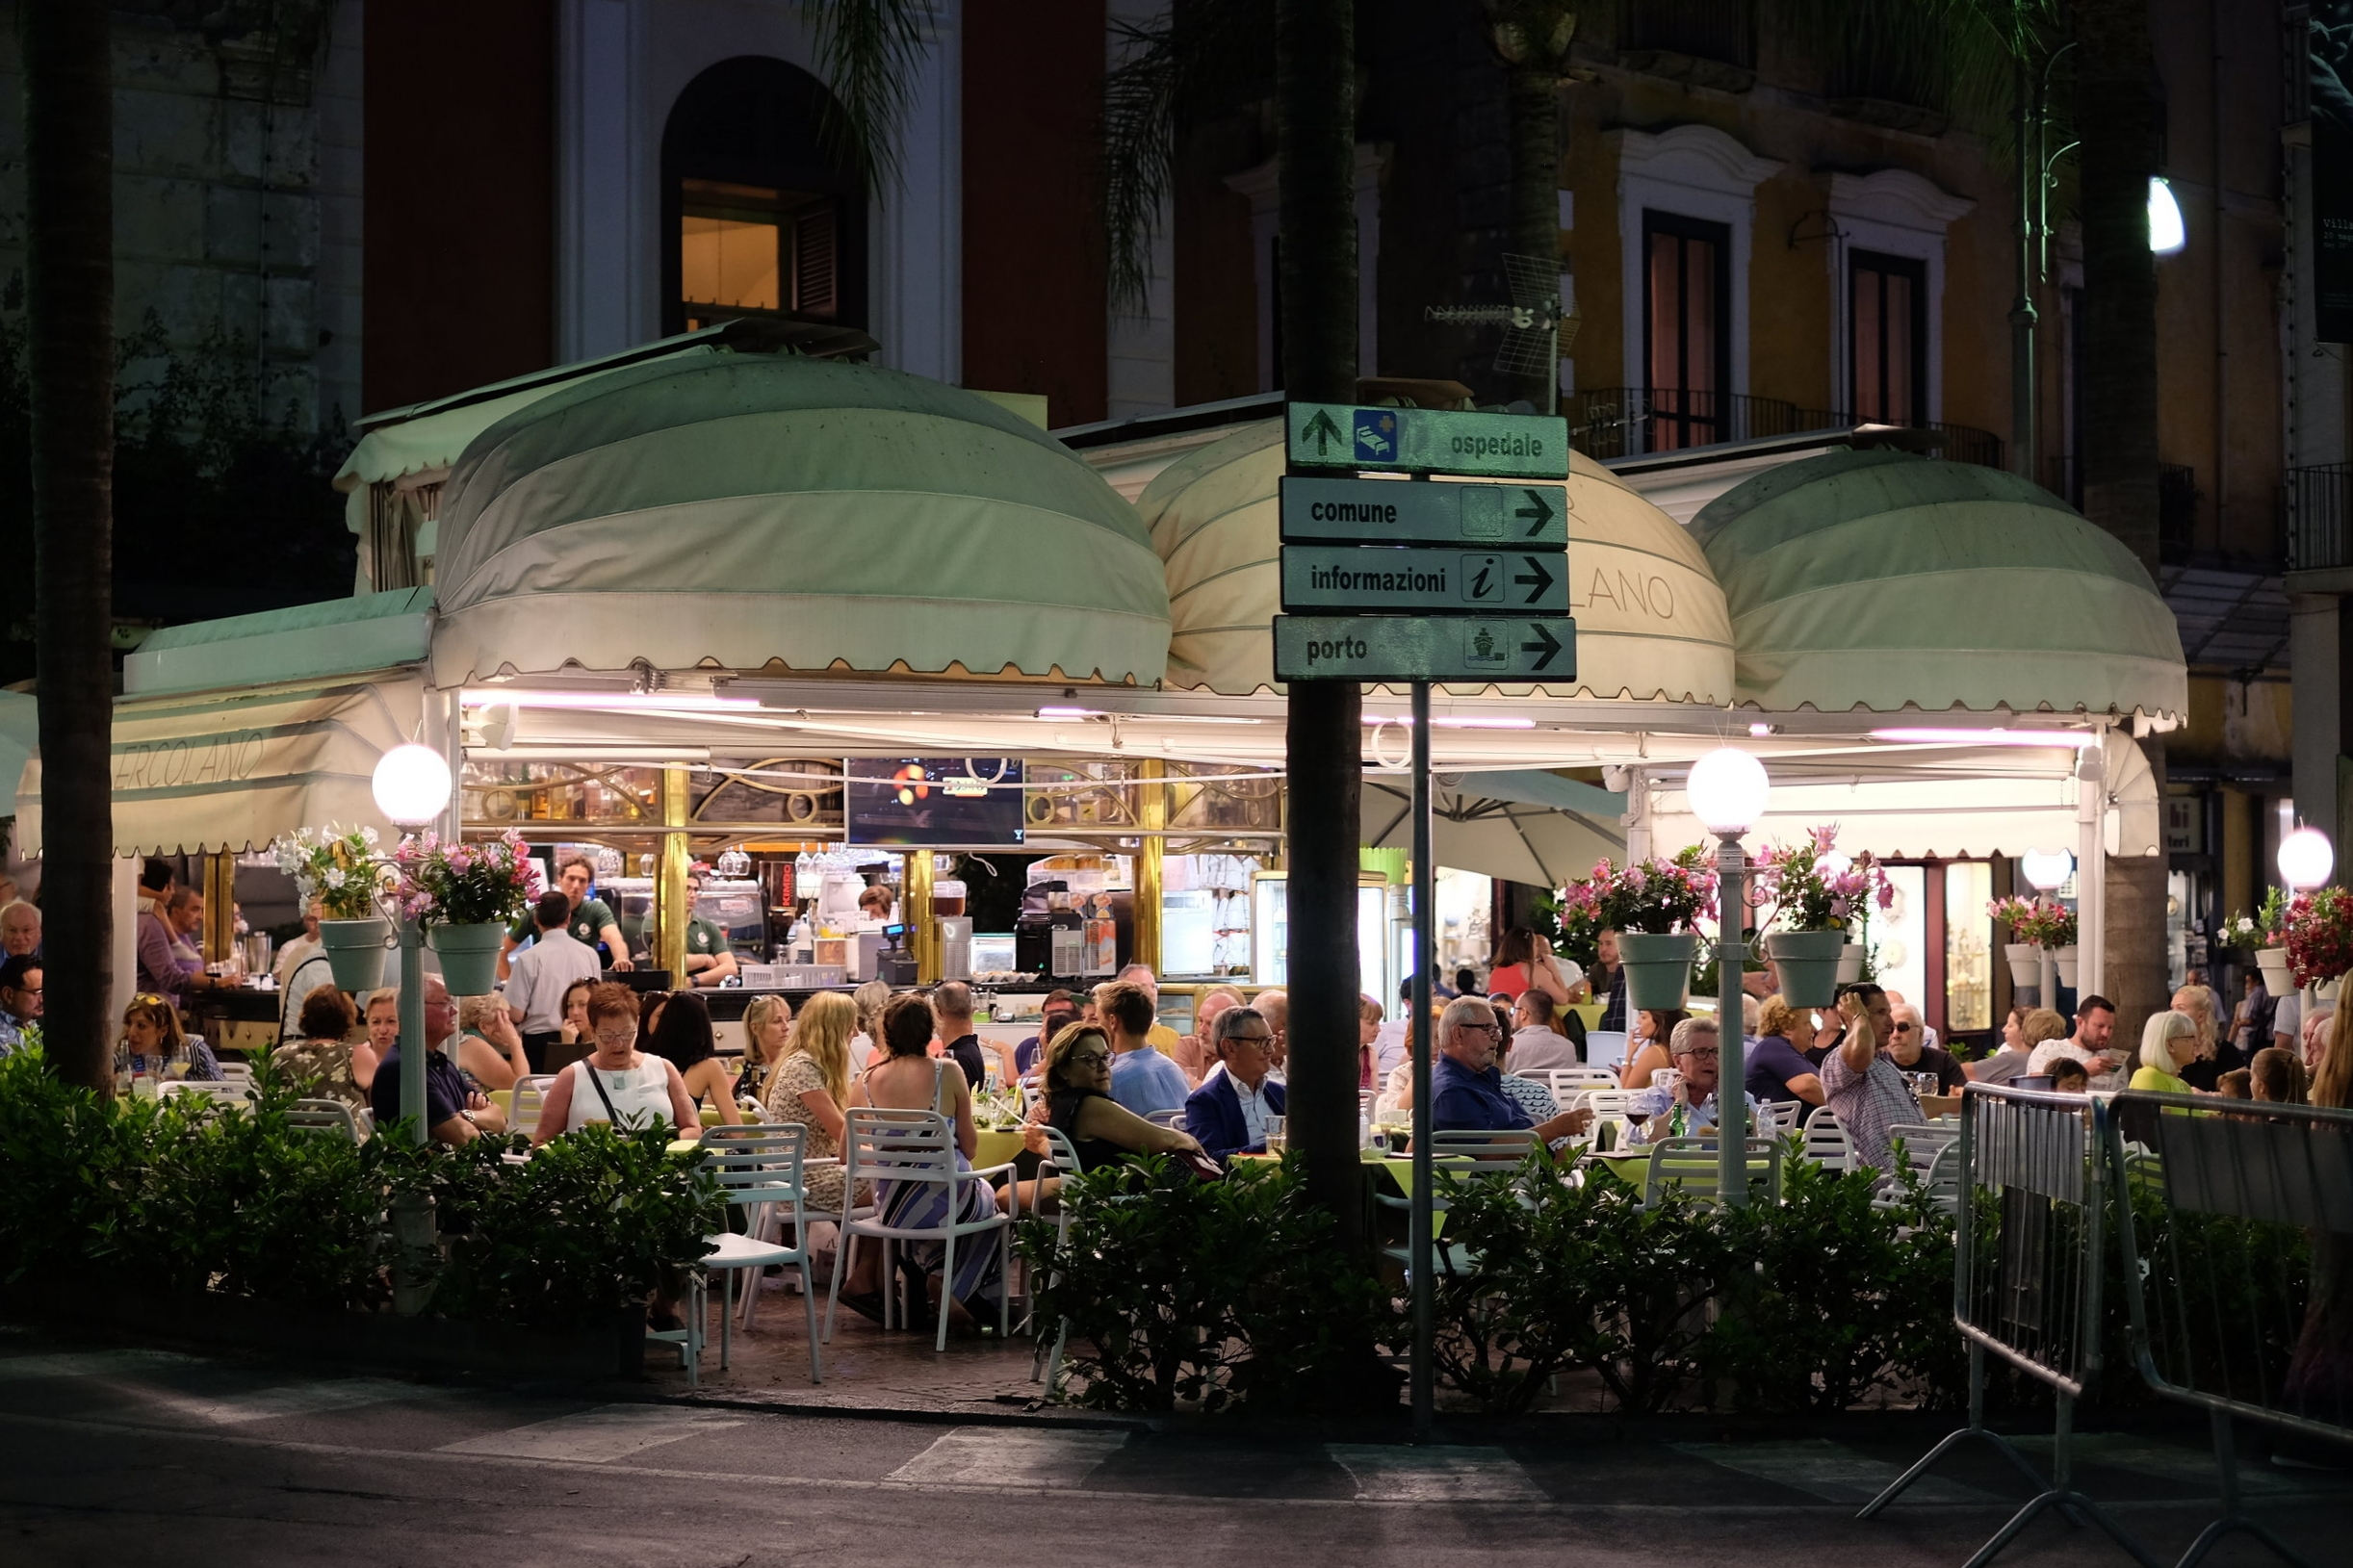 Bar Ercolano. Both bar are in Piazza Tasso.